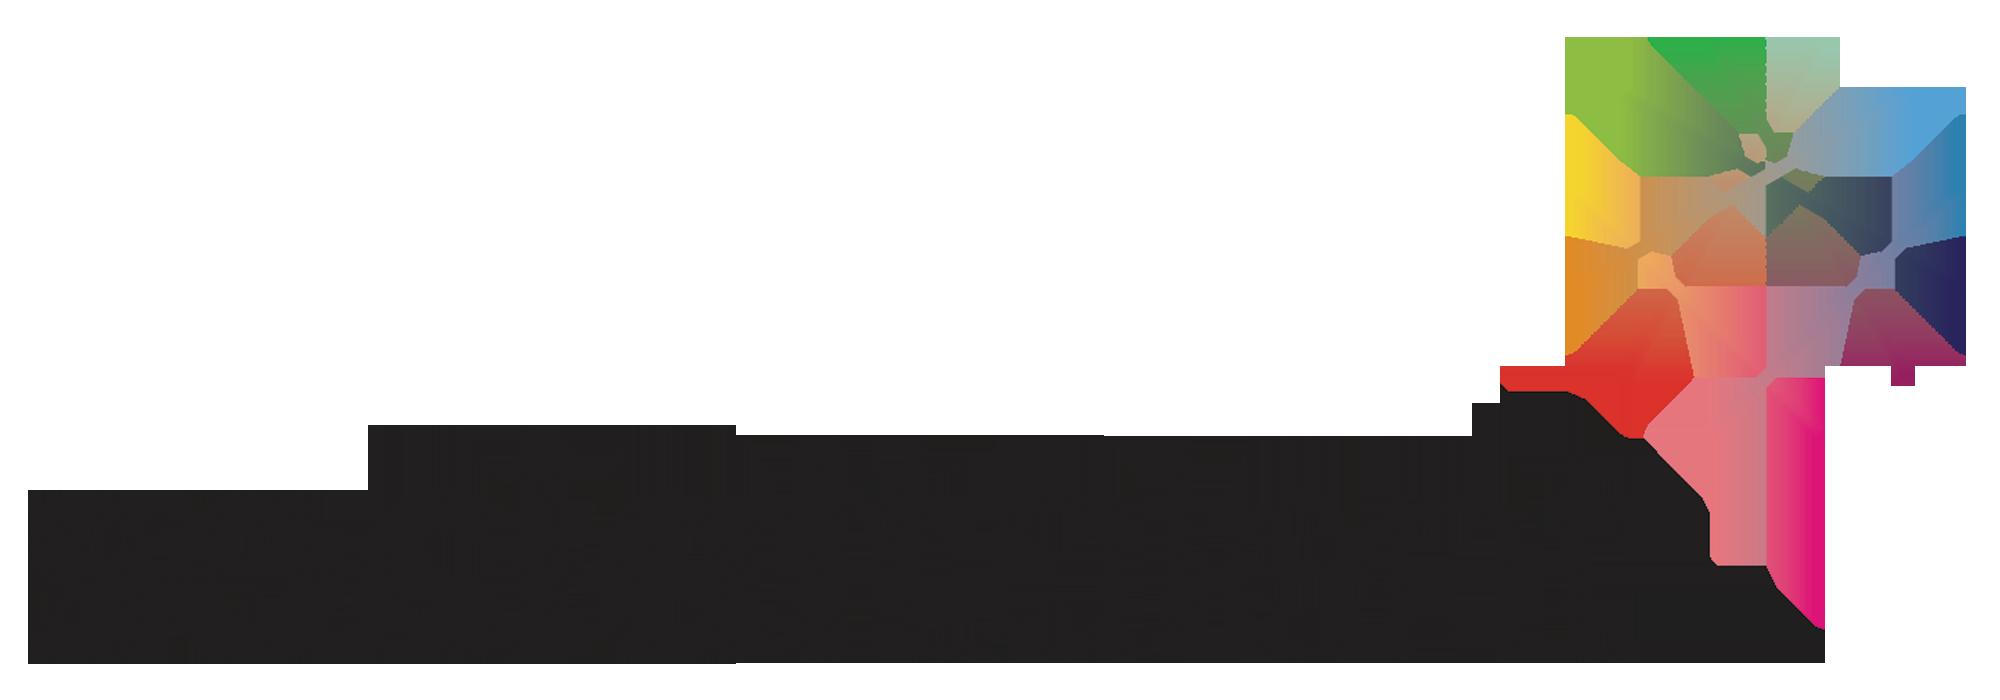 Social Talent People Analytics